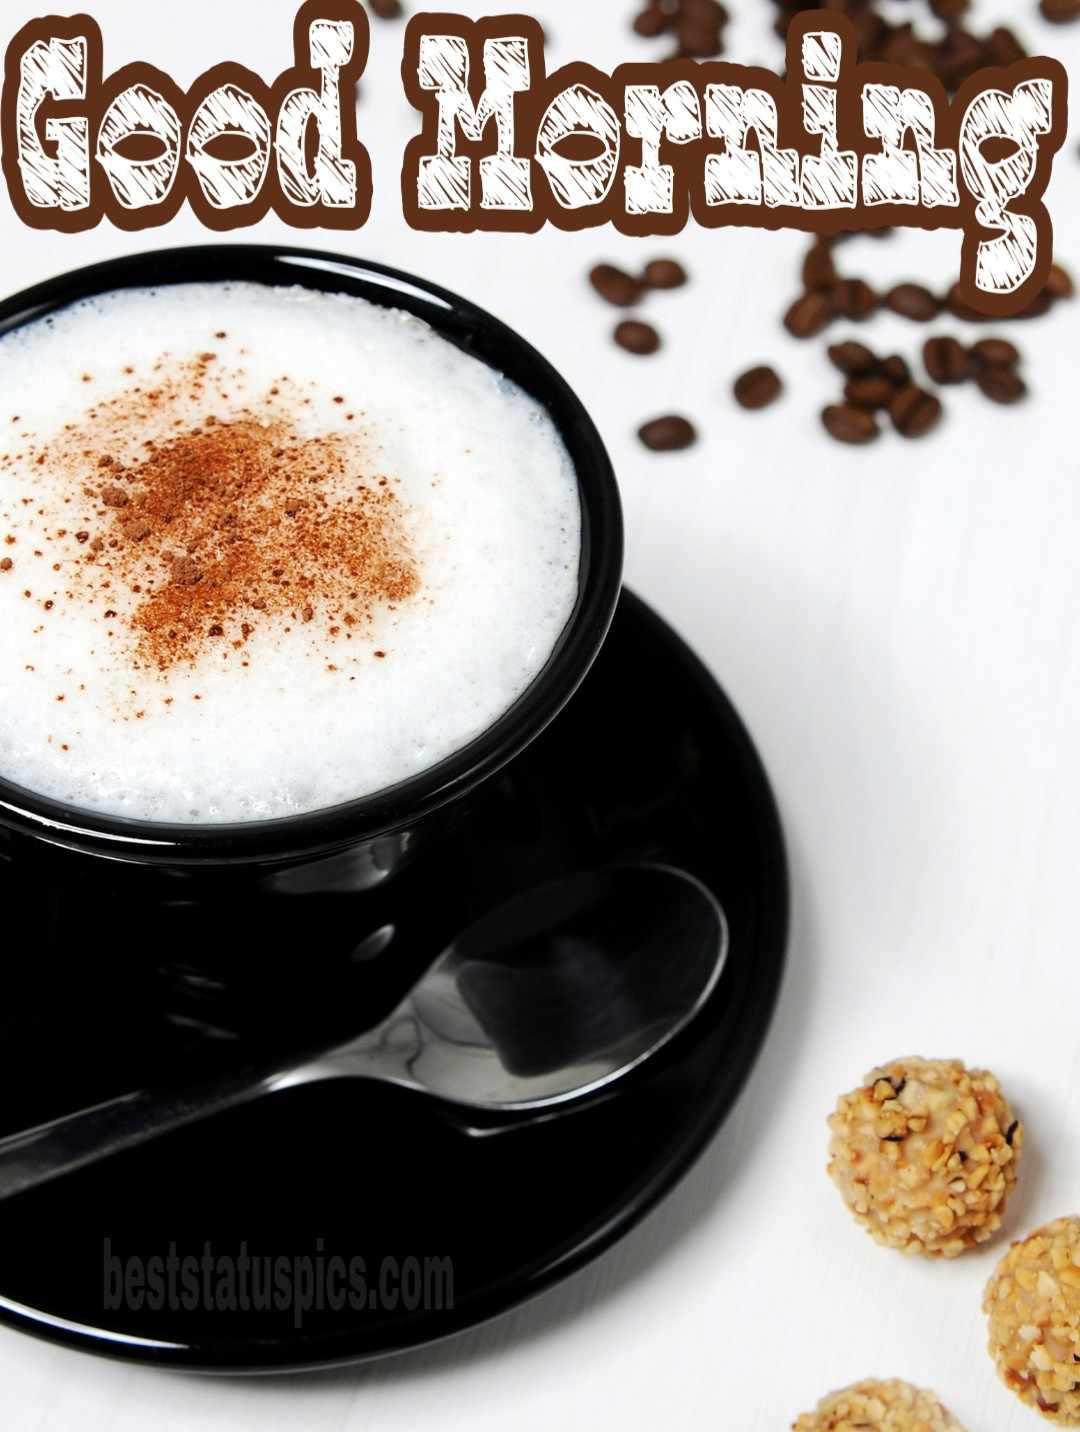 Good morning coffee wallpaper HD